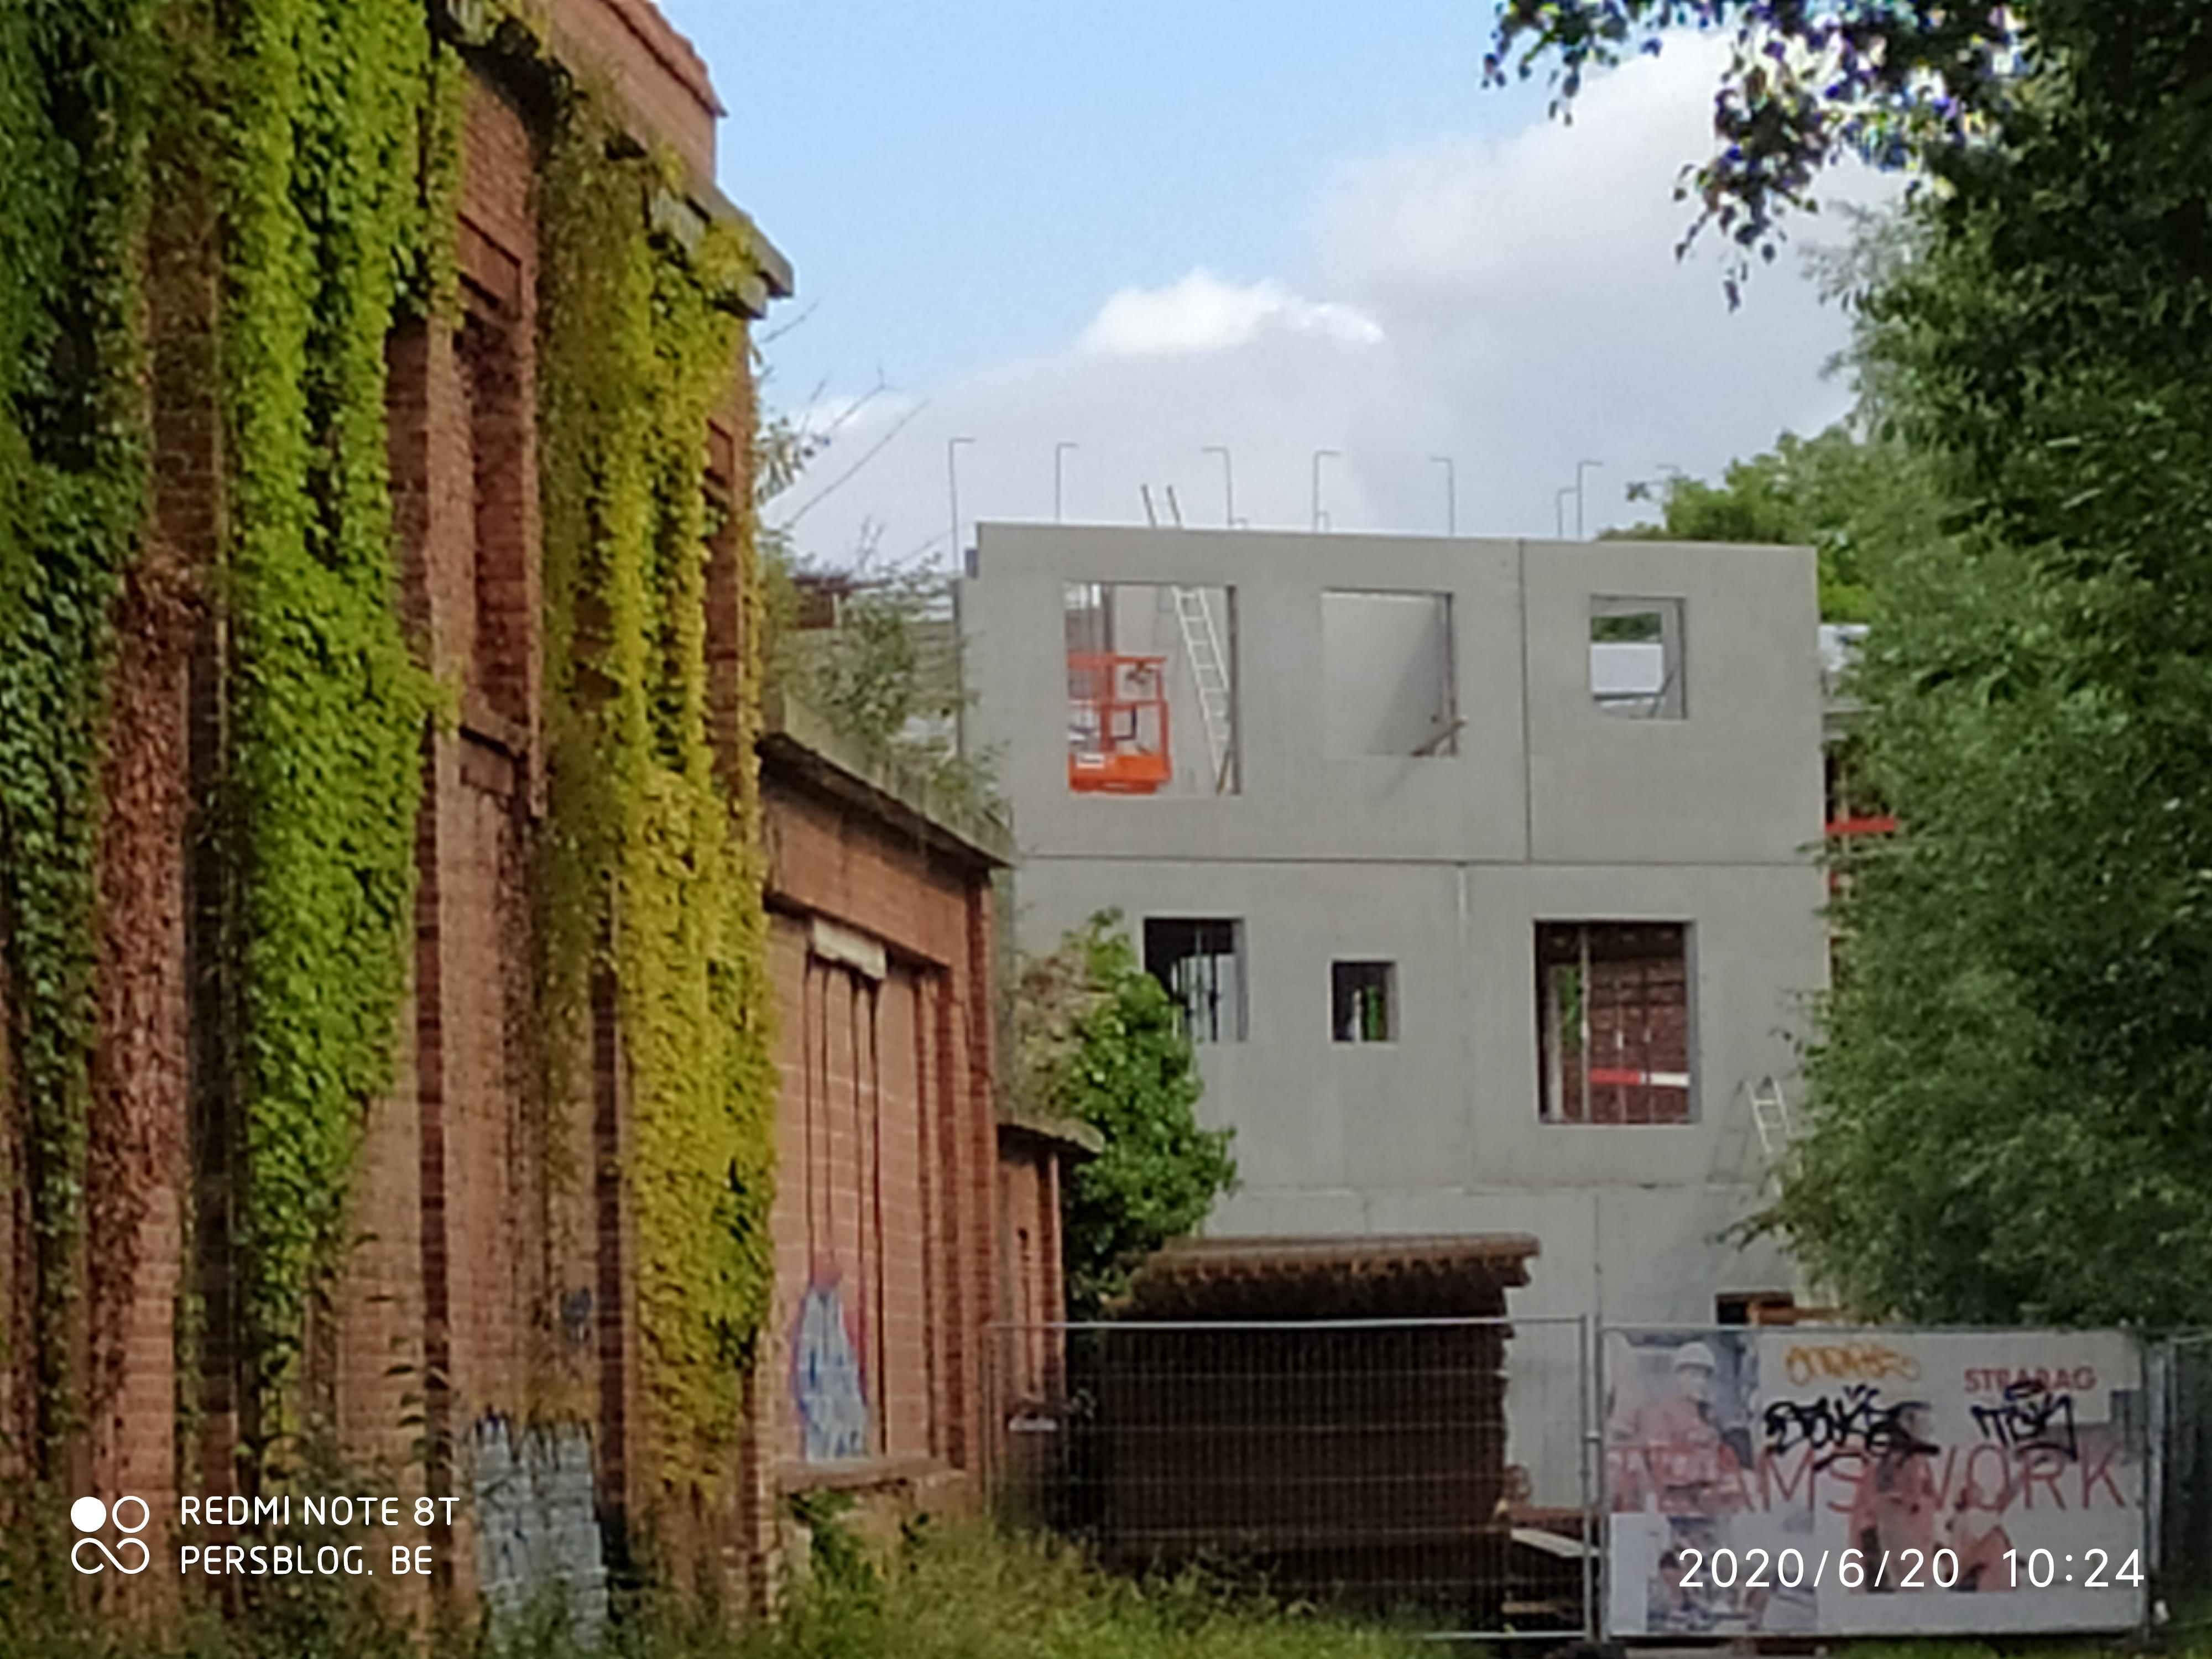 Nijverheidstraat - Bijgaardepark - Sint-Amandsberg IMG_20200620_100410 (8)